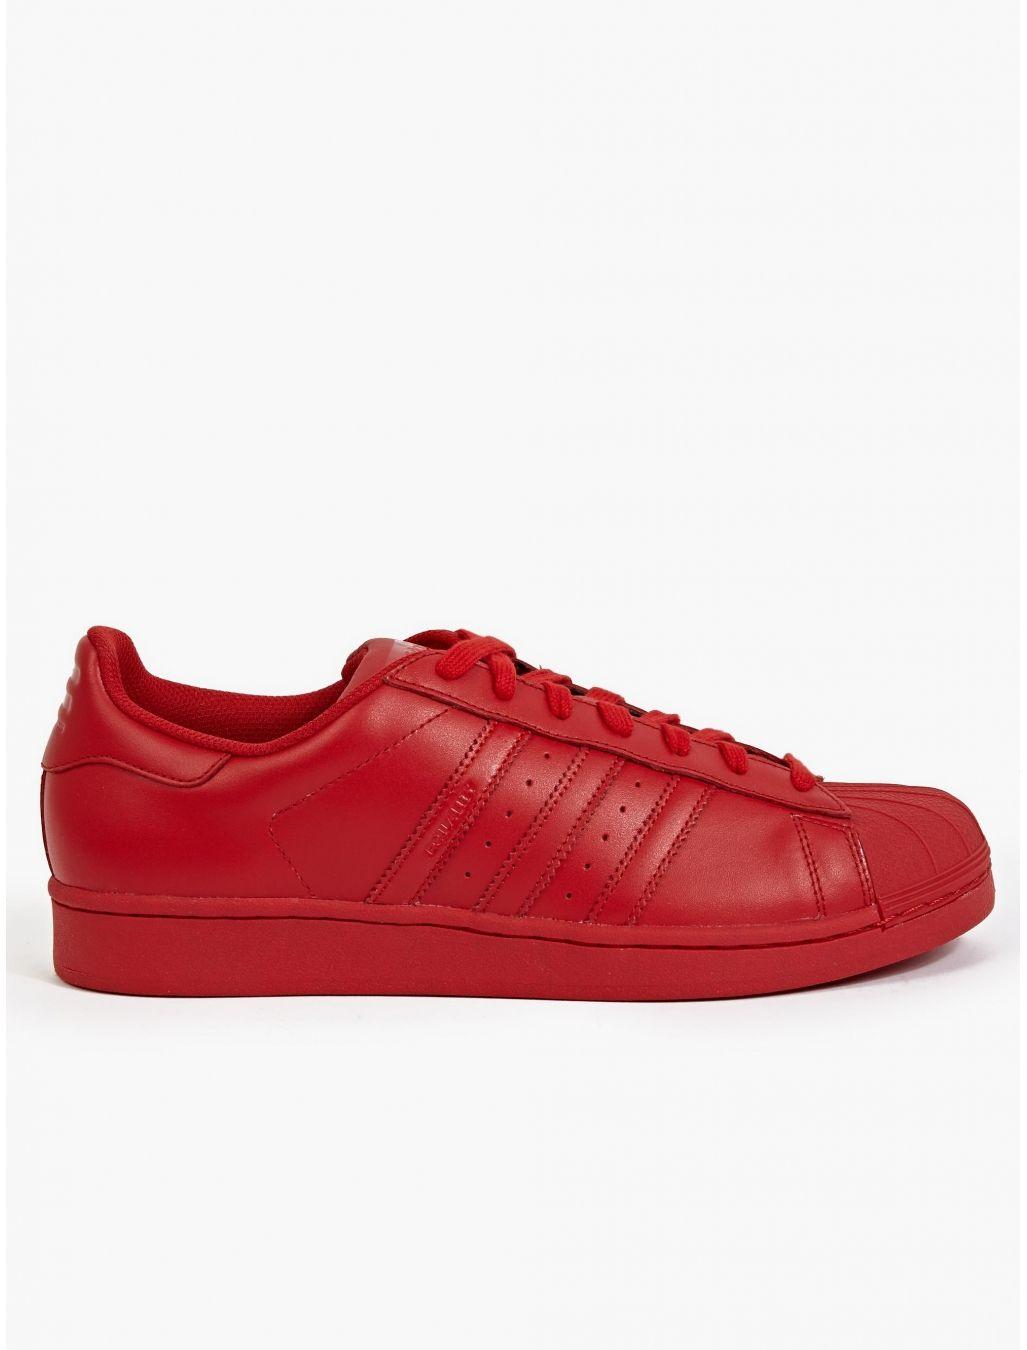 pretty nice 2ddc2 e2639 adidas Originals Men s Red Supercolor Pack Superstar Sneakers   oki-ni